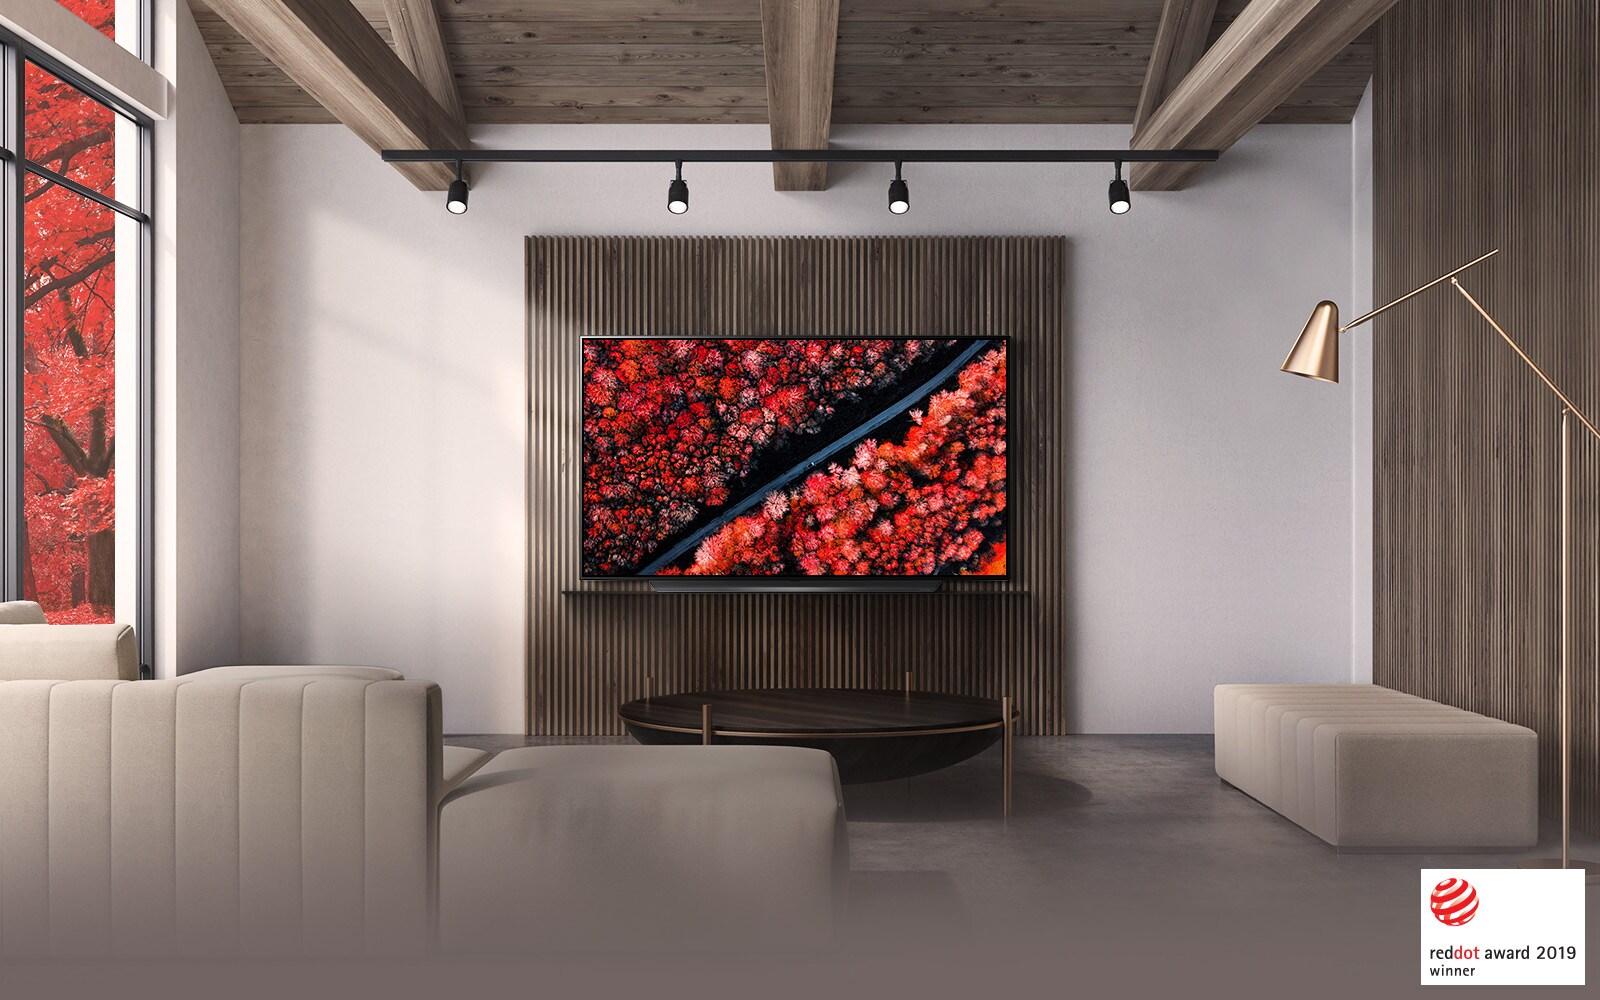 TV-OLED-C9-06-Design-Desktop